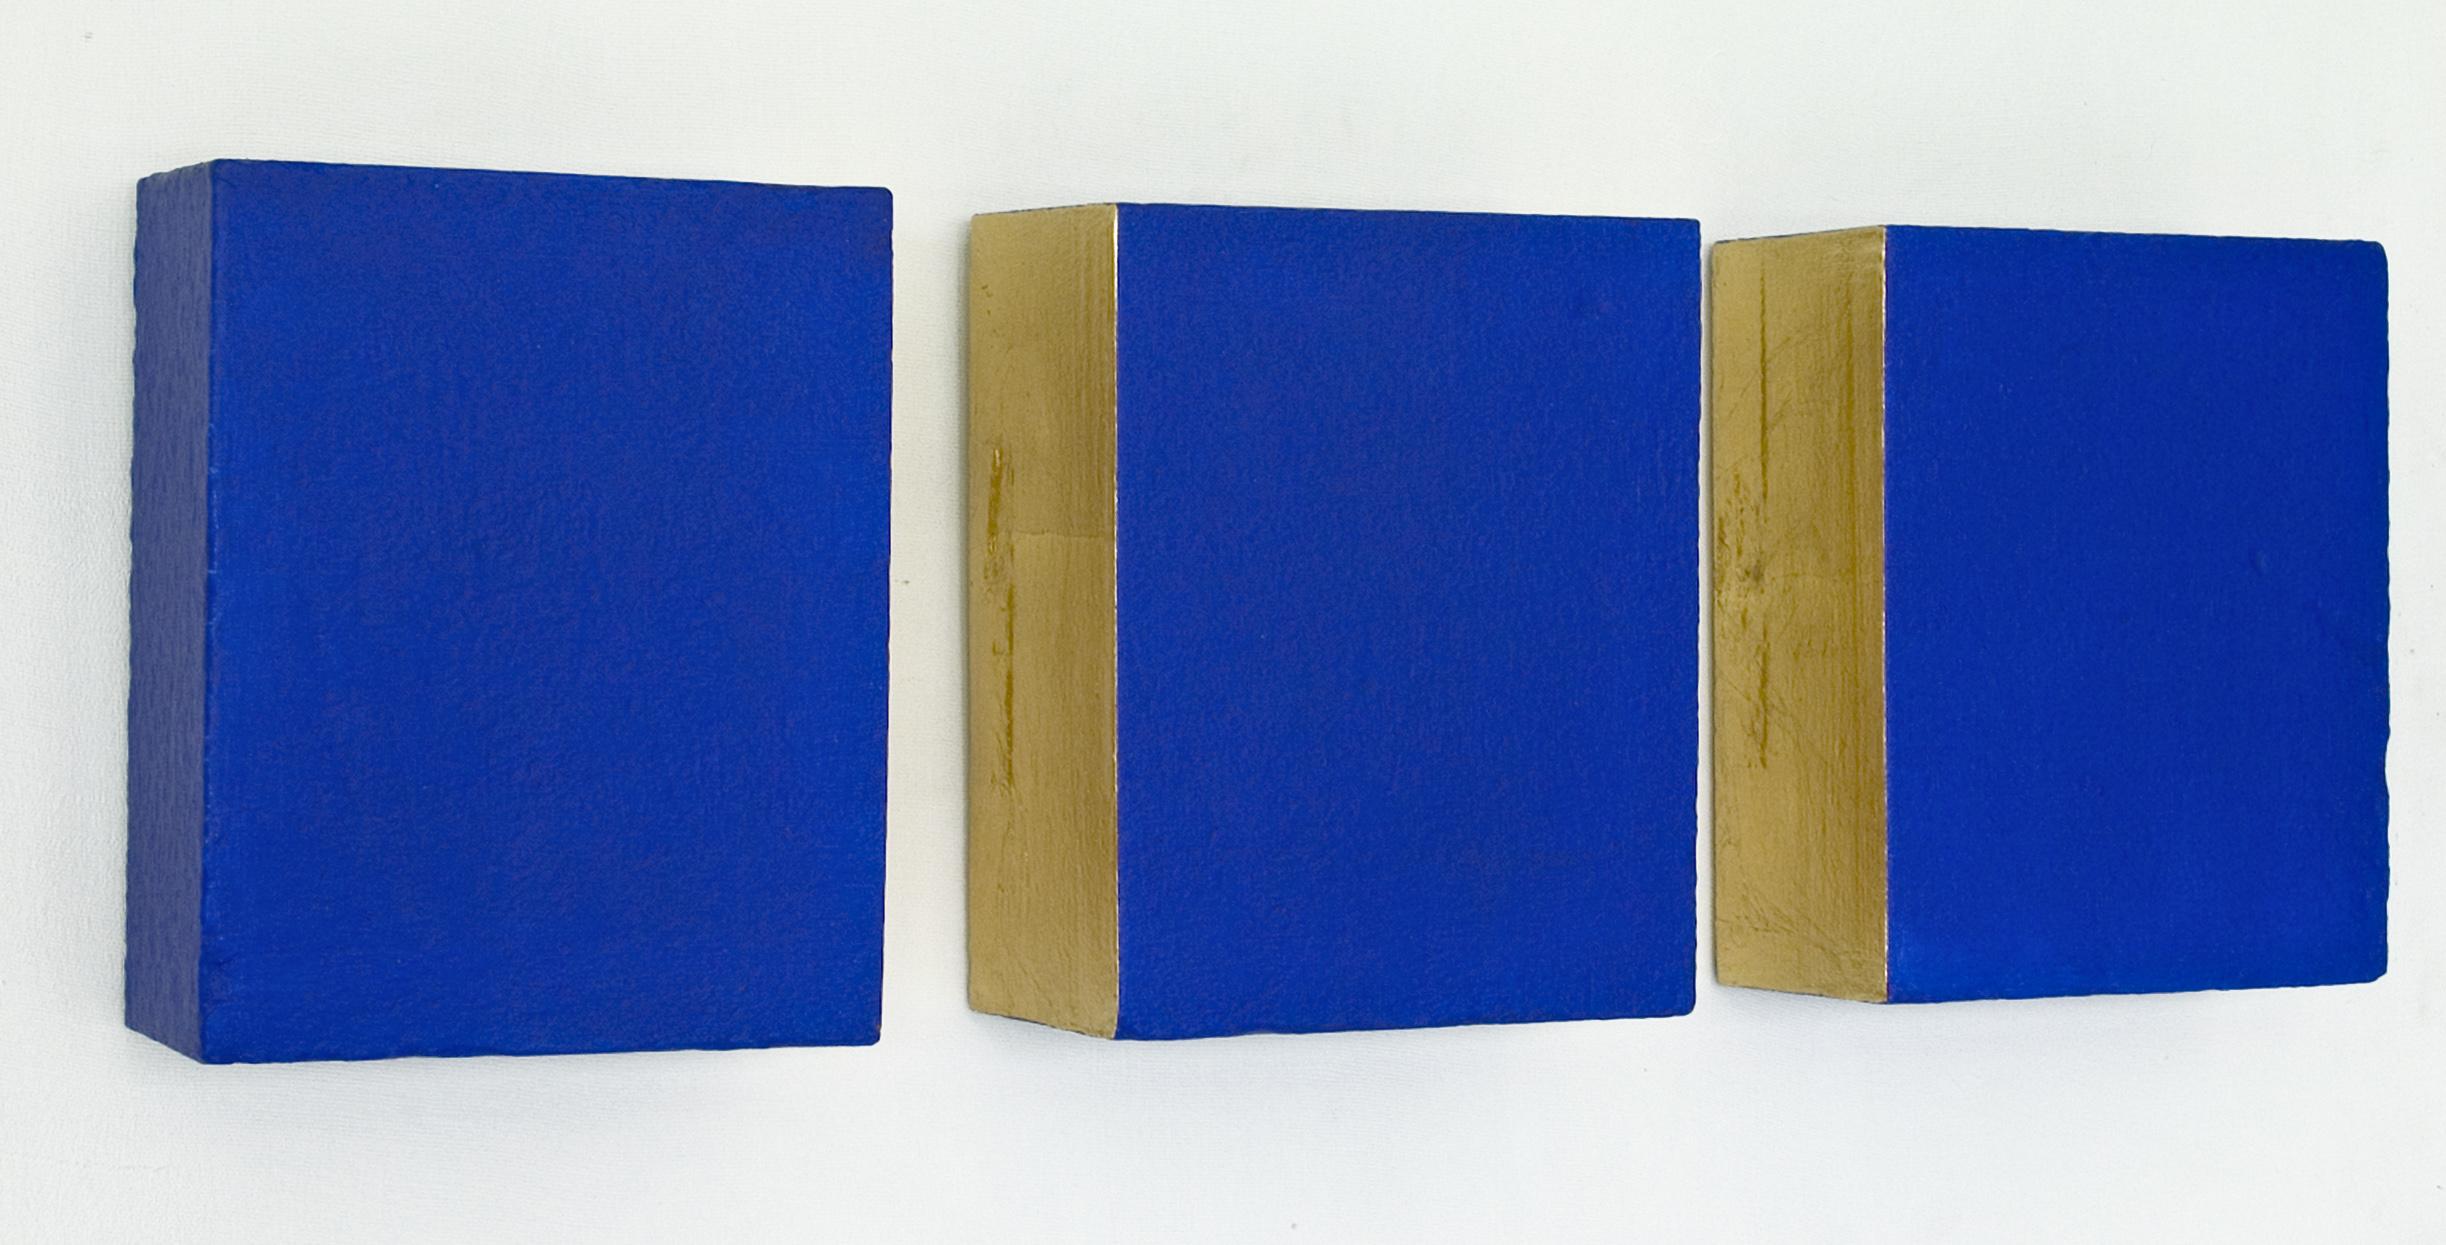 ECCE HOMO, akril, tekstil, siporeks, trikrat 25 x 20 cm, 2000